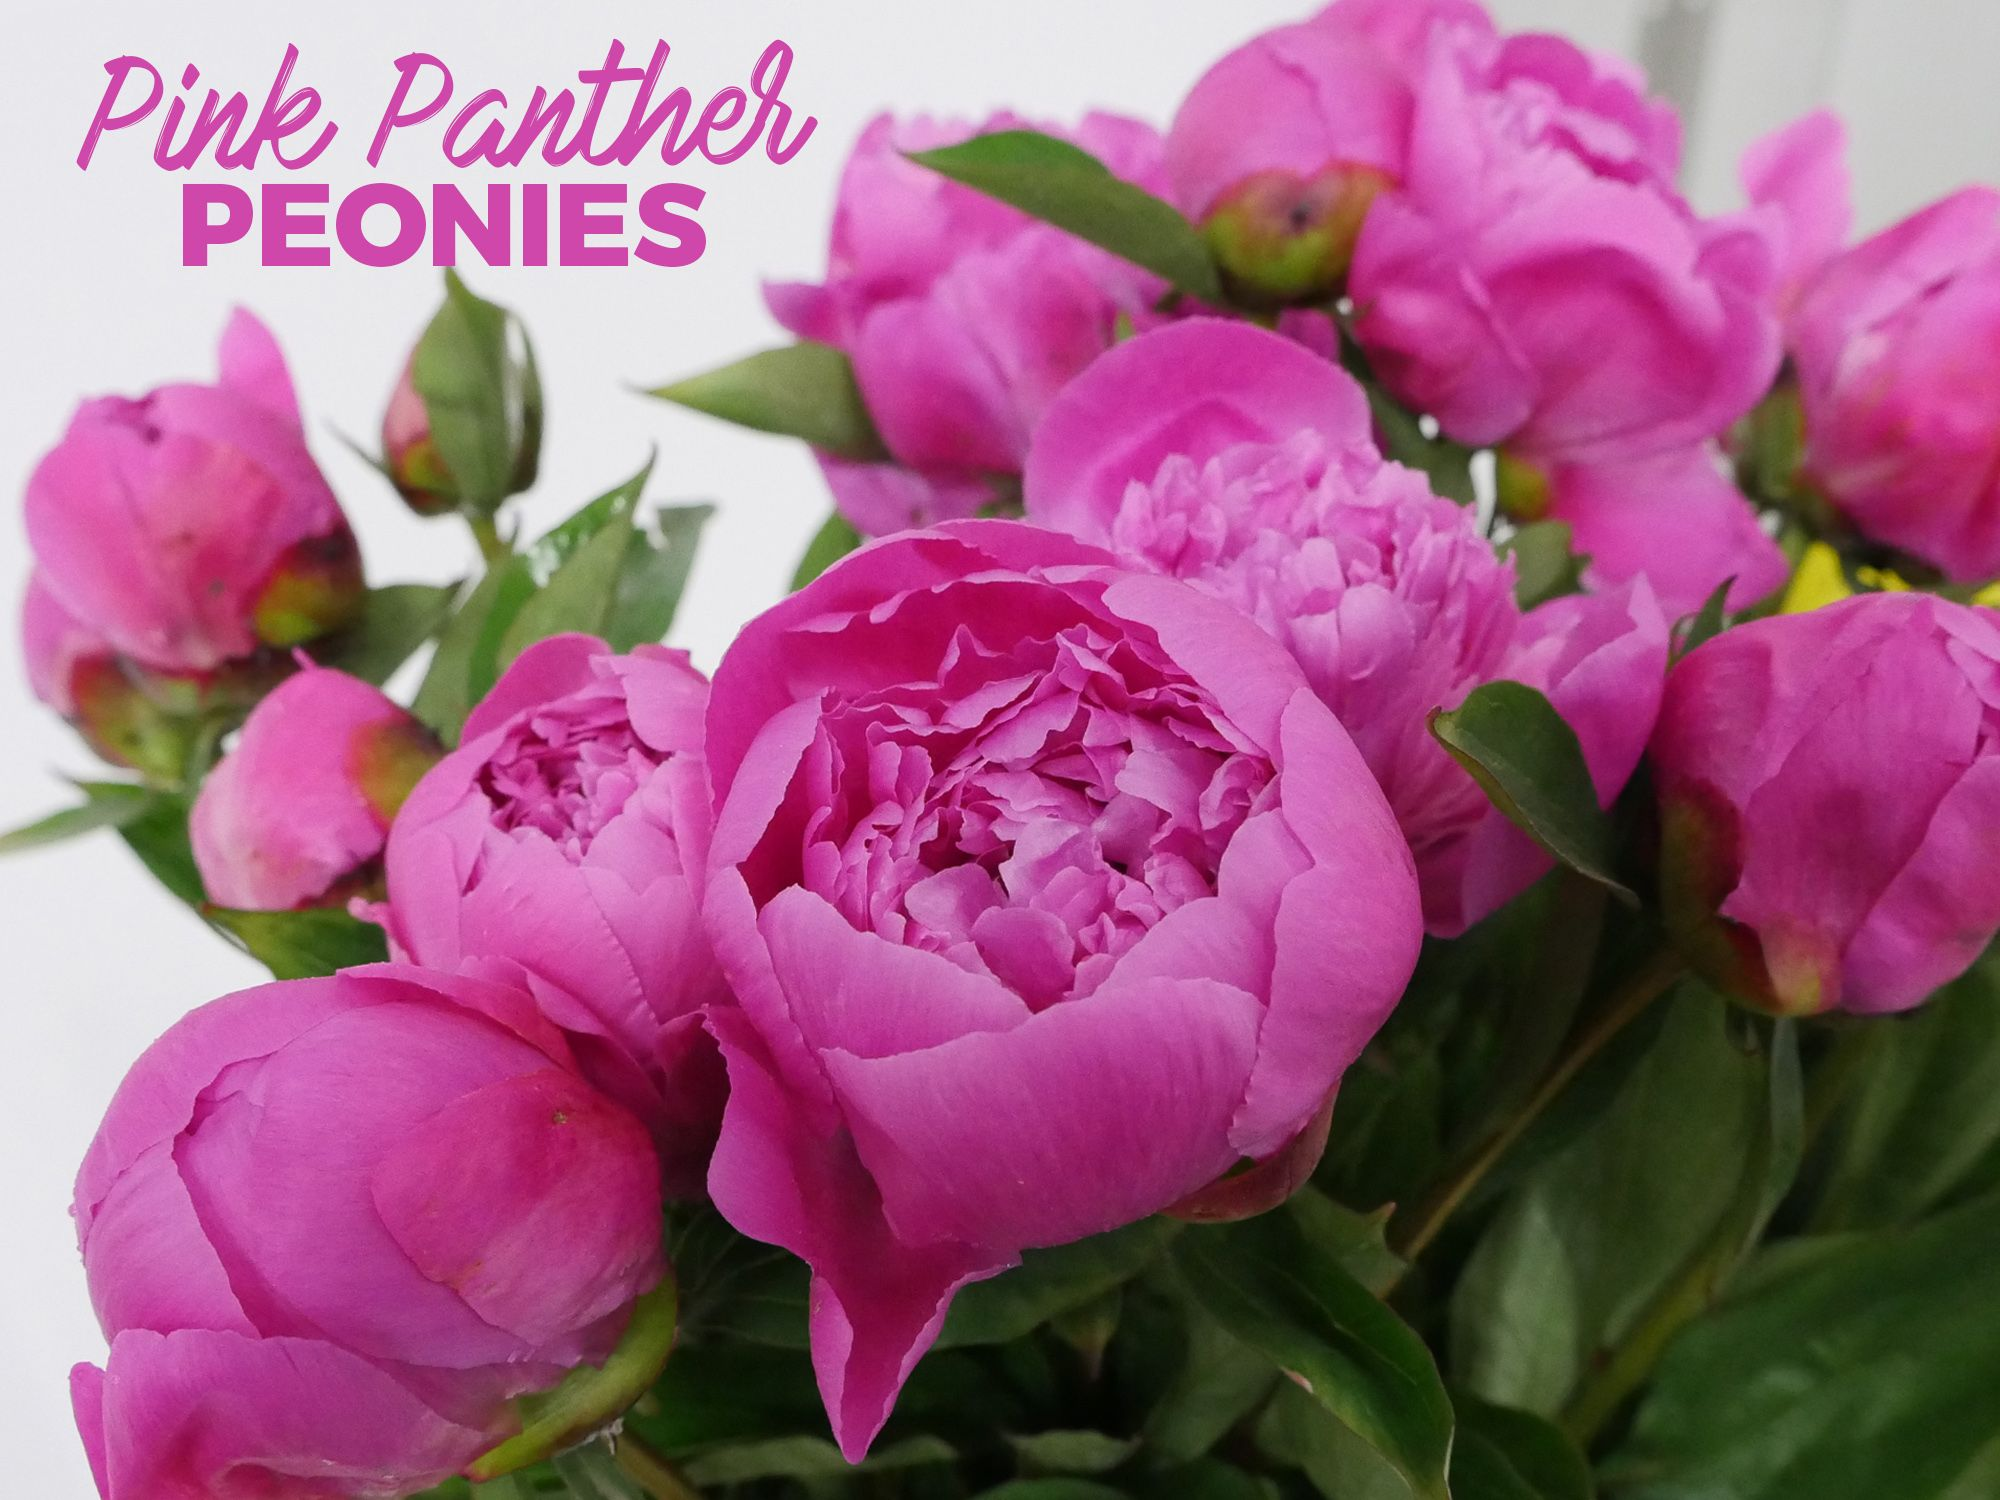 Jet fresh flowers is your miami peony headquarters fresh flowers jet fresh flowers is your miami peony headquarters pink panthersbridal mightylinksfo